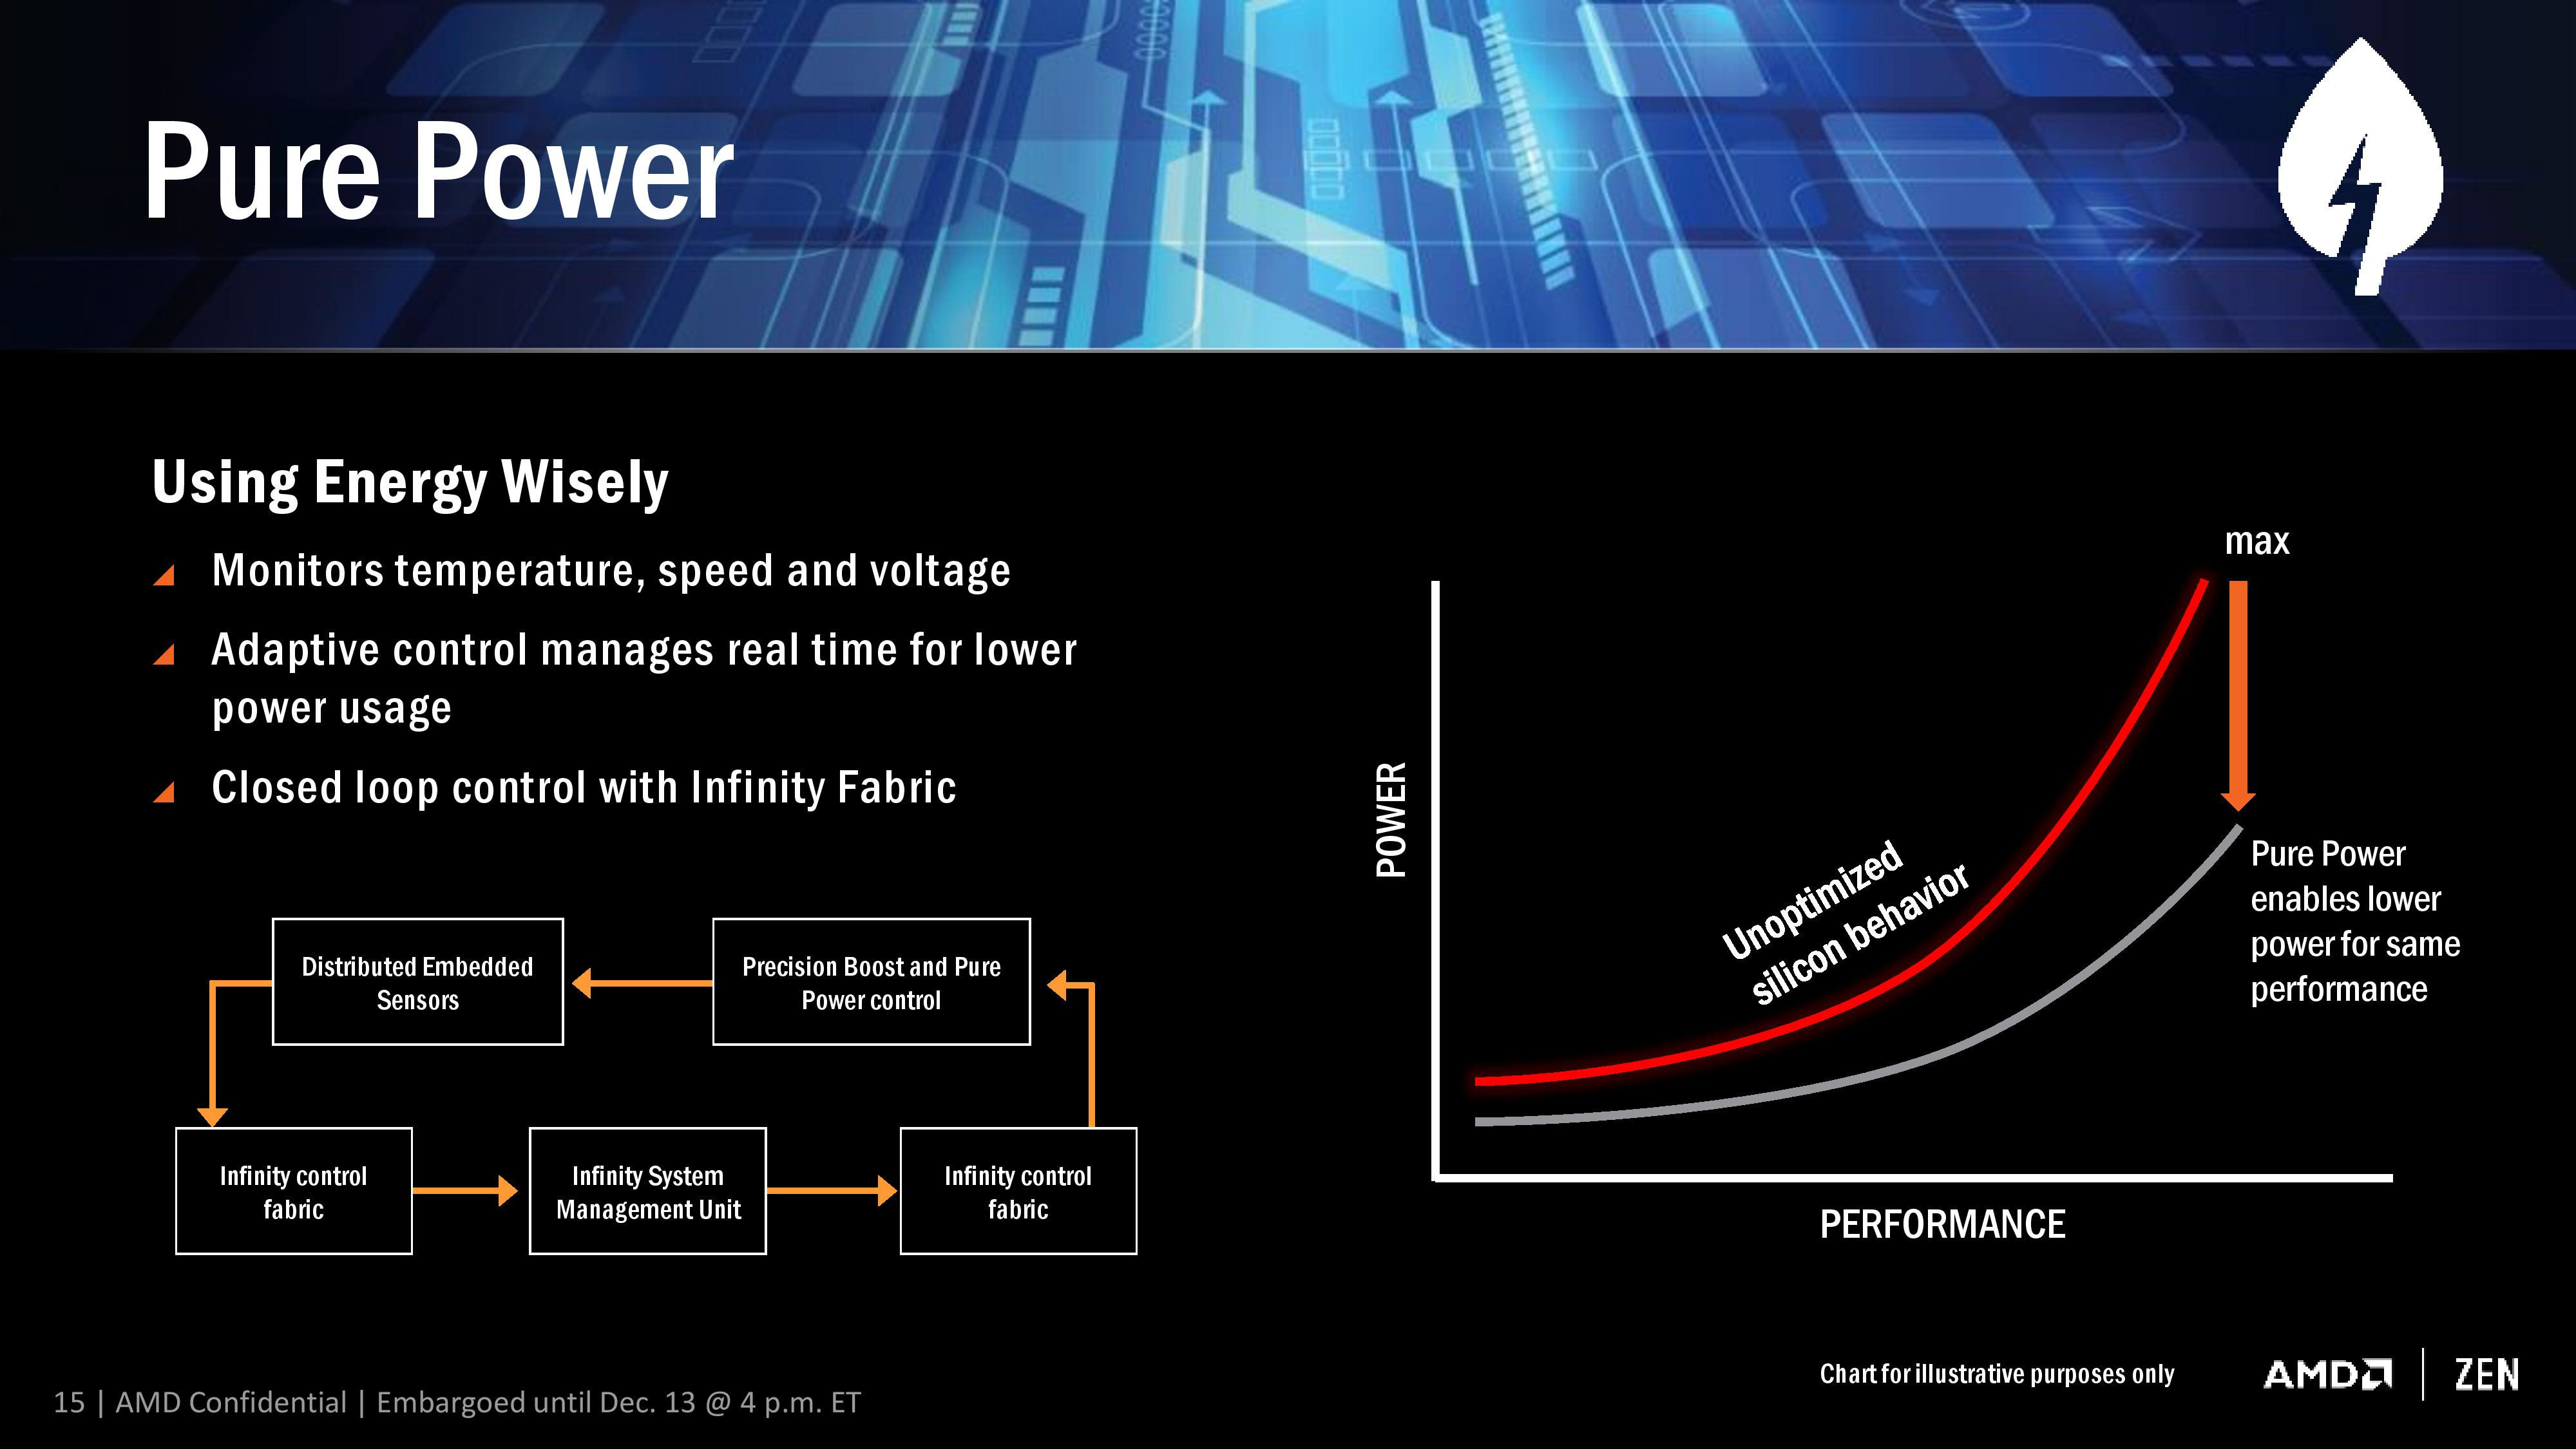 Amd Releases Chipset Drivers 17 10 Whql With Ryzen Balanced Power Plan Techpowerup